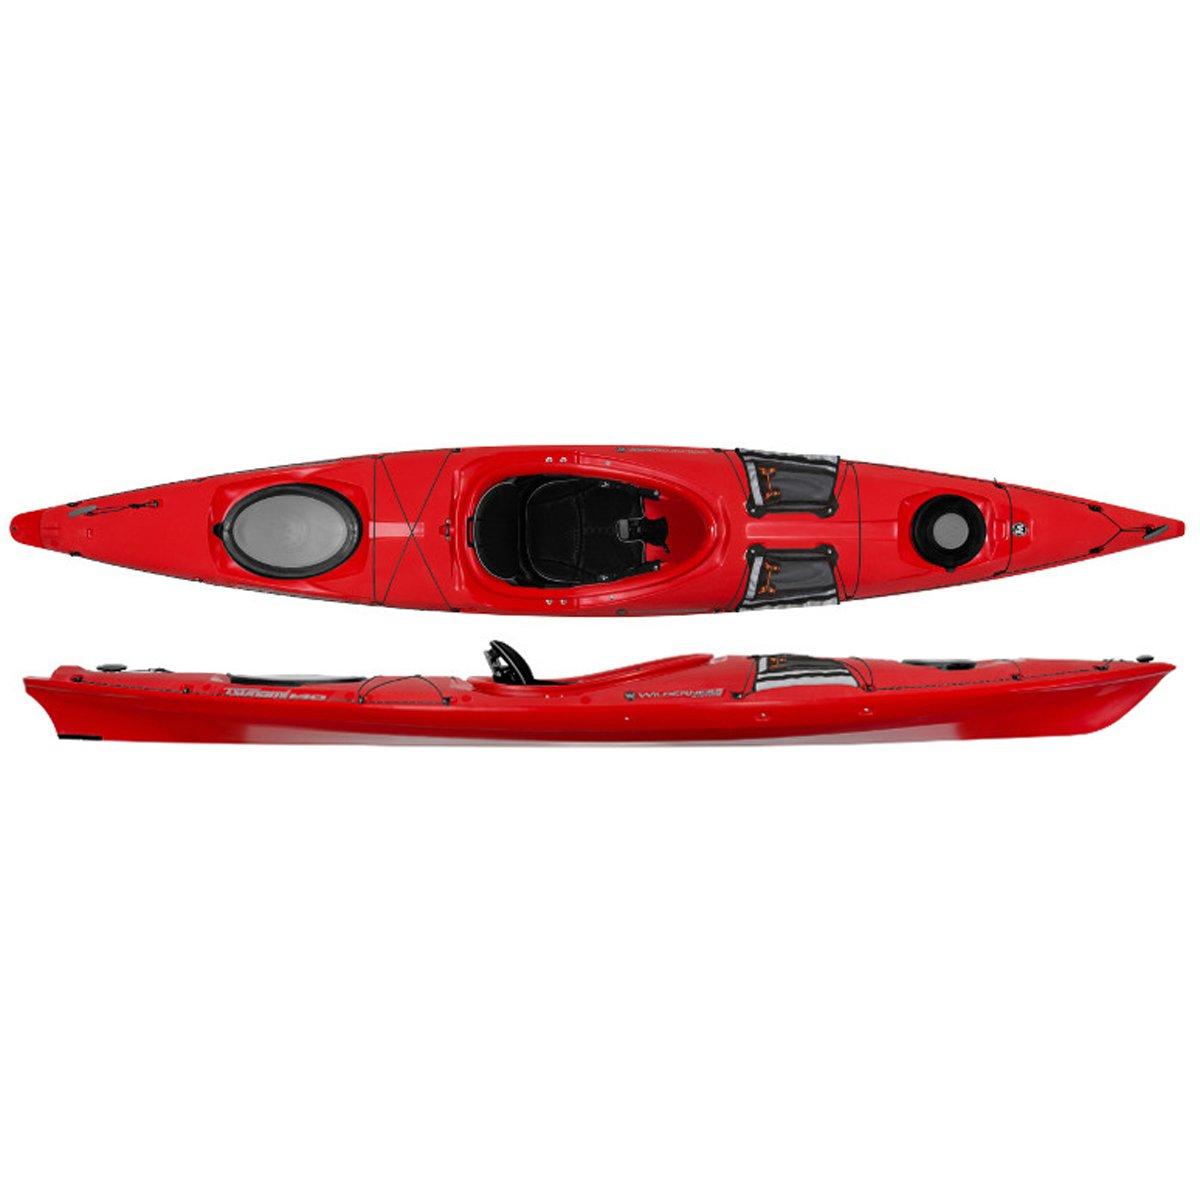 Wilderness Systems 9720408040 Tsunami 140 Kayaks, Red, 14'